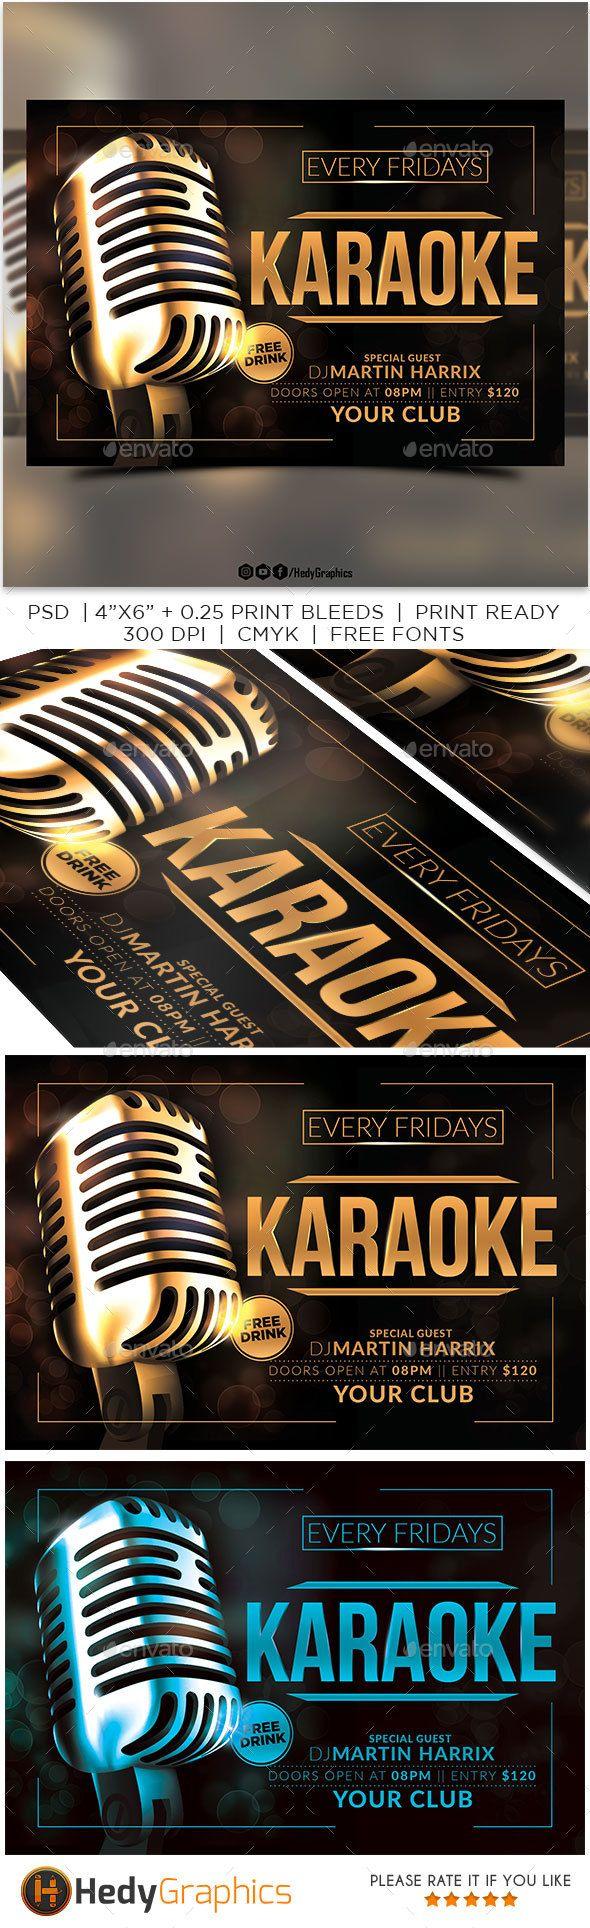 Karaoke Flyer Template Psd Design Flyer Templates Pinterest